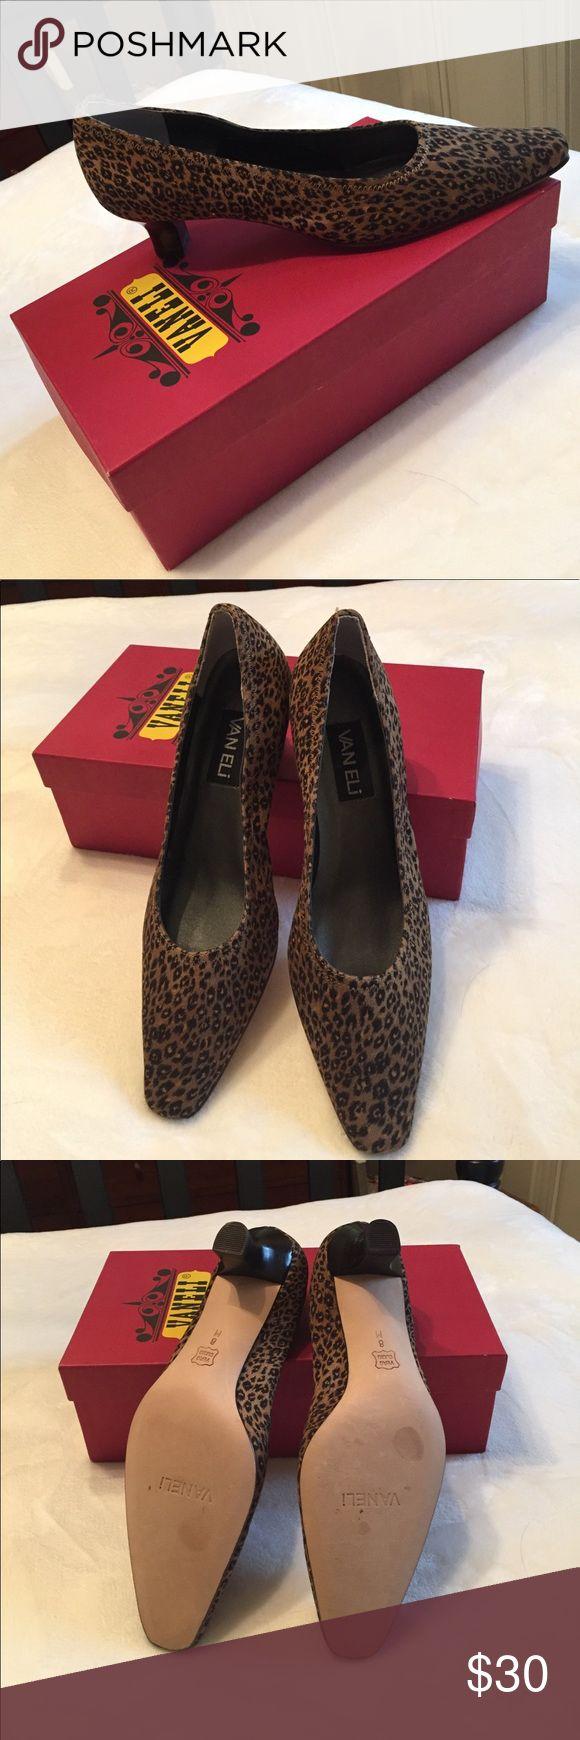 Vaneli Cheetah dress shoe Vaneli cheetah print dress shoe. Low, slightly chunky heel. Brand new - never been worn. Vaneli Shoes